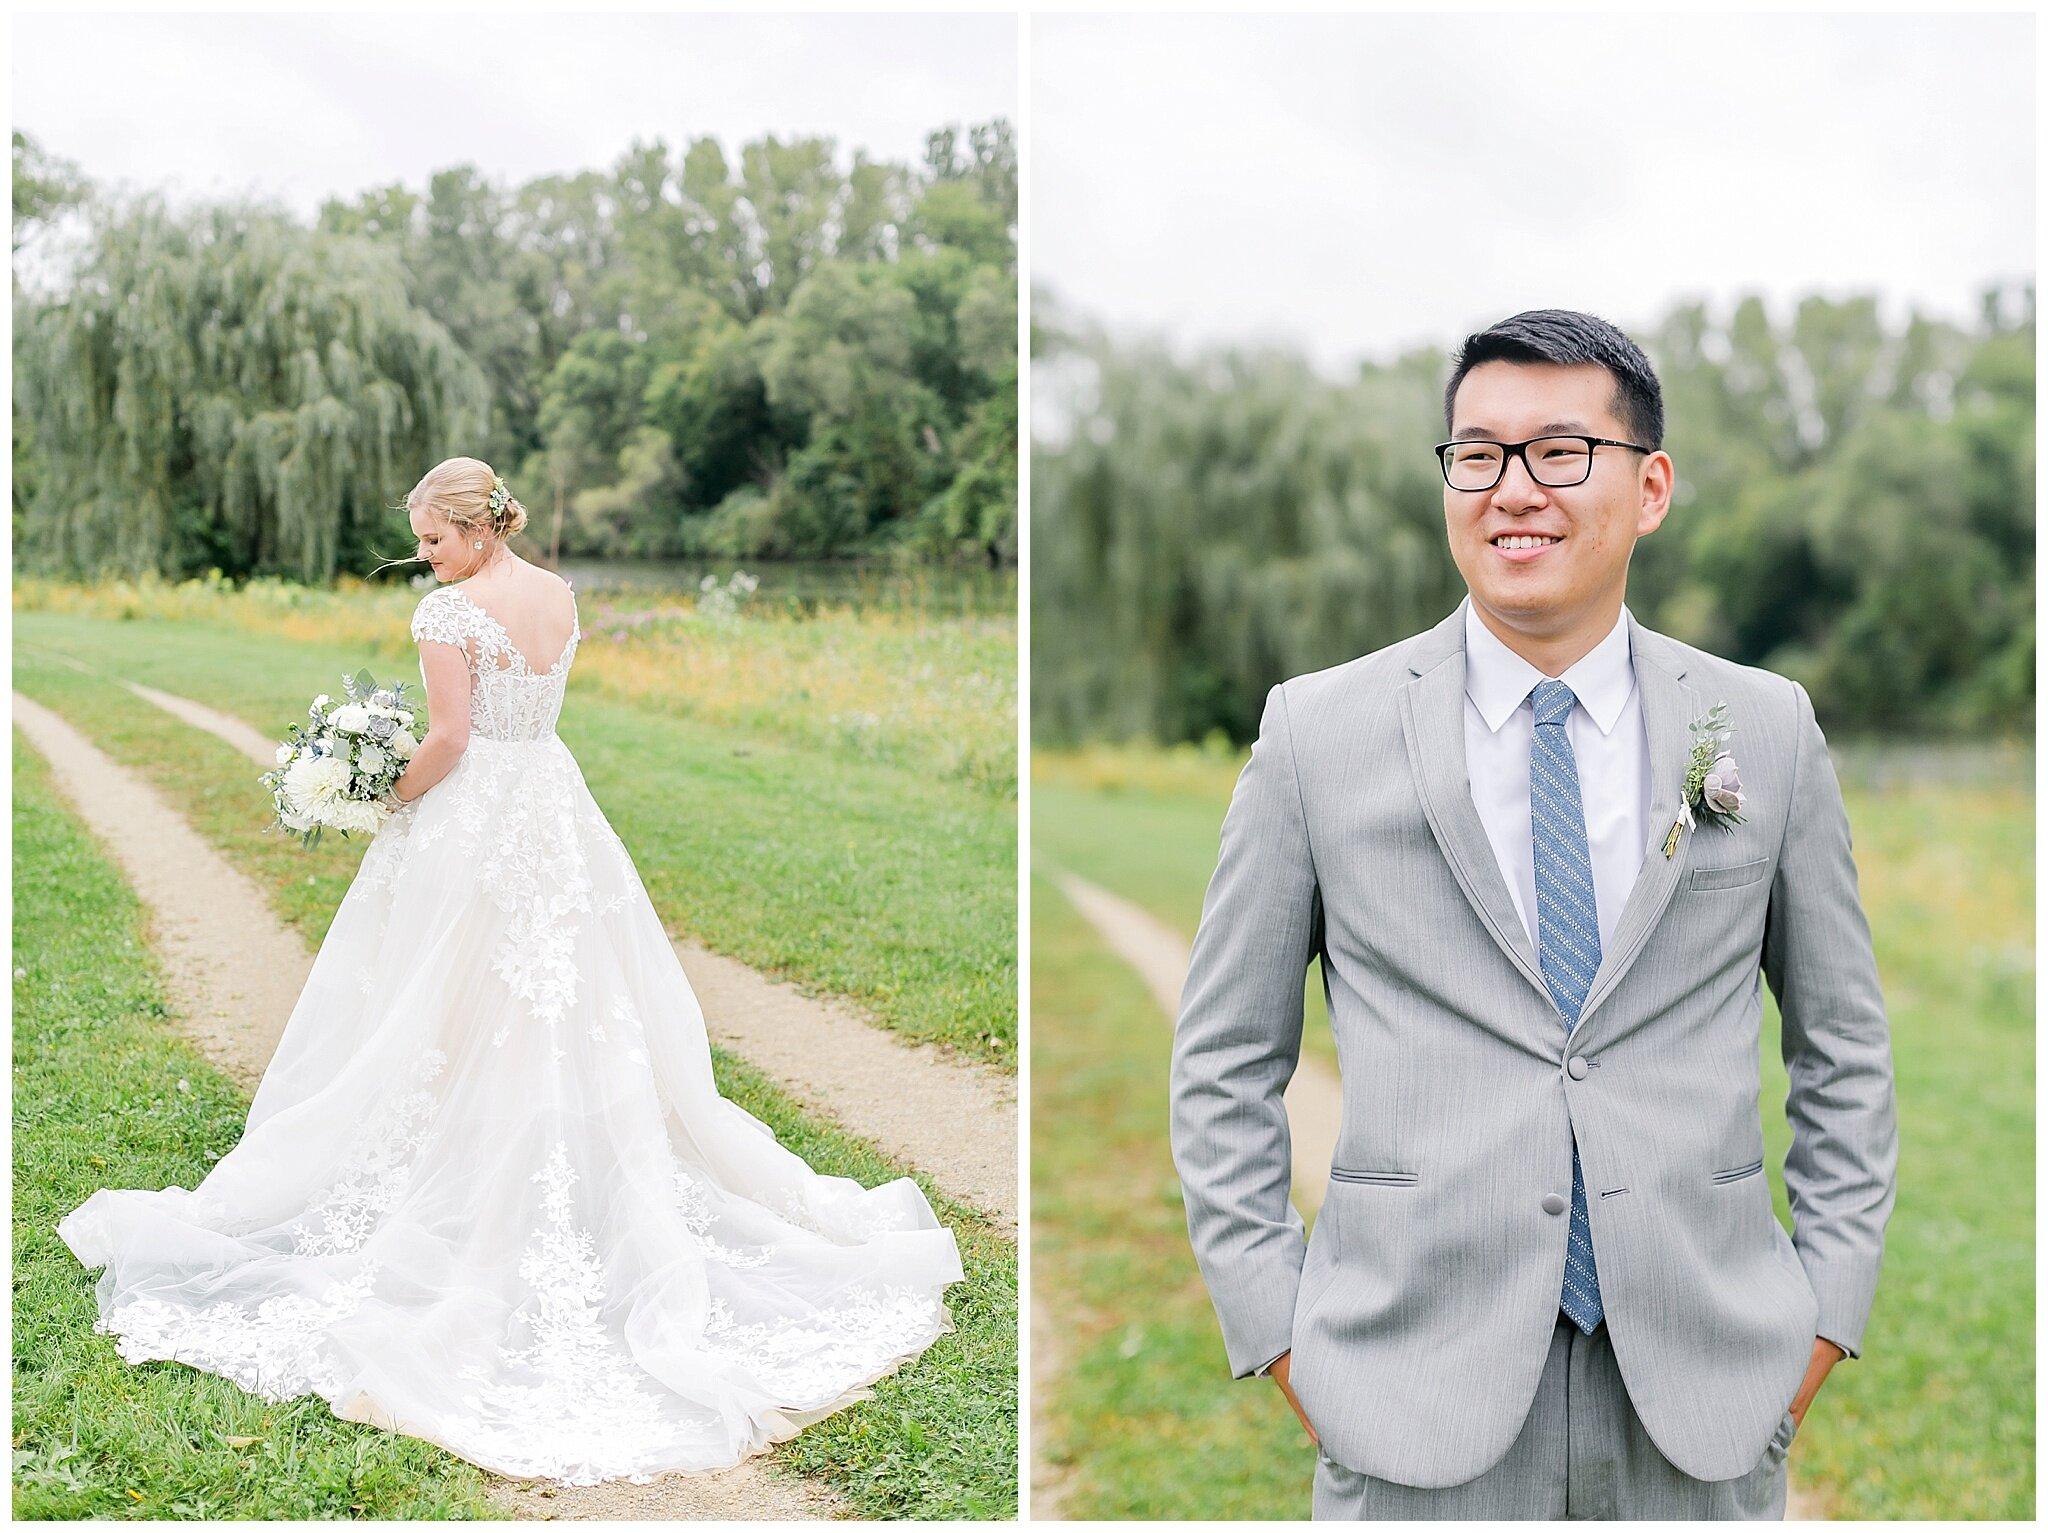 the_lageret_stoughton_wisconsin_wedding_madison_wisconsin_wedding_photographers_0253.jpg